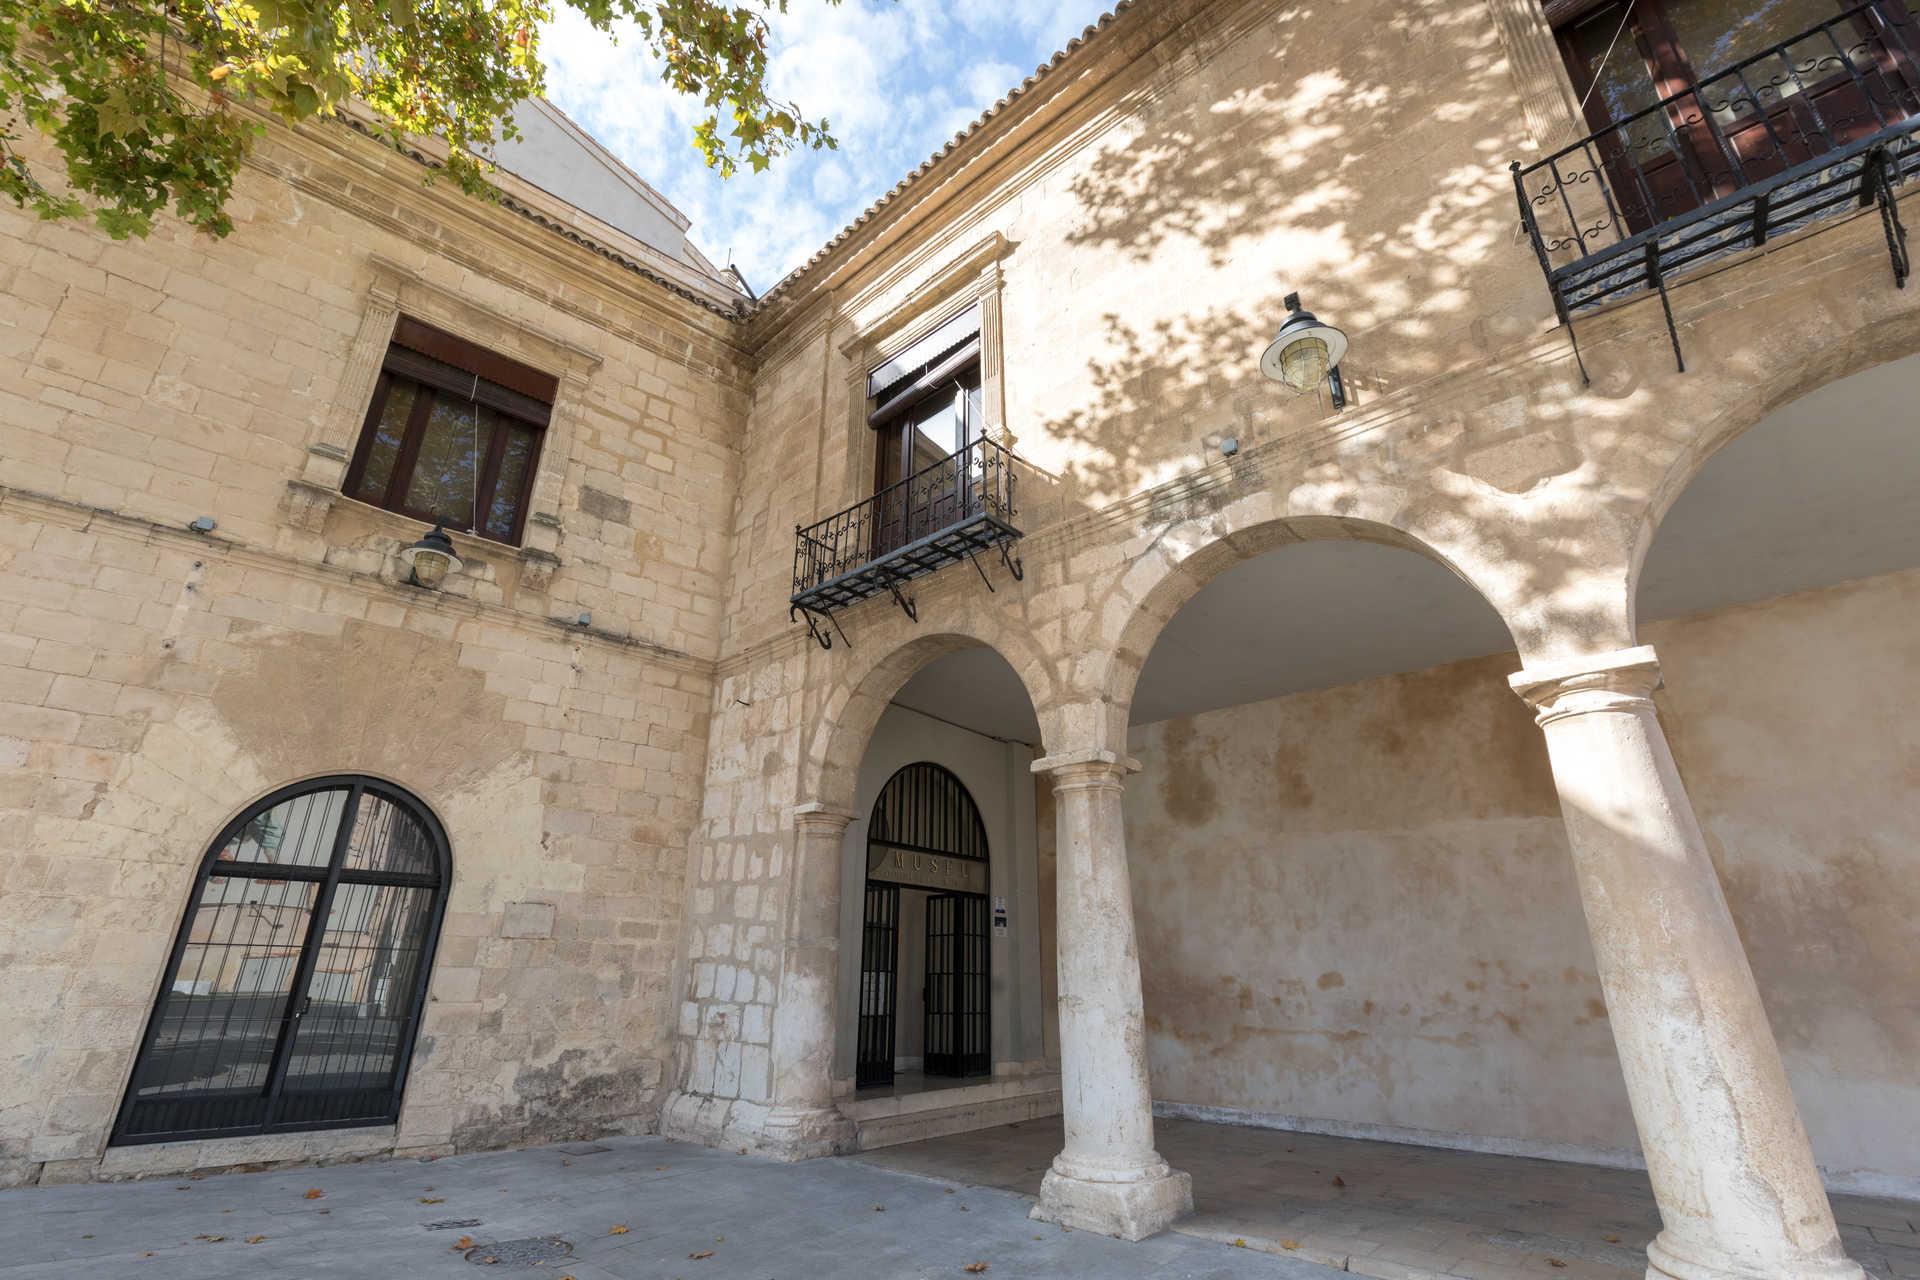 Museo Arqueológico Camil Visedo